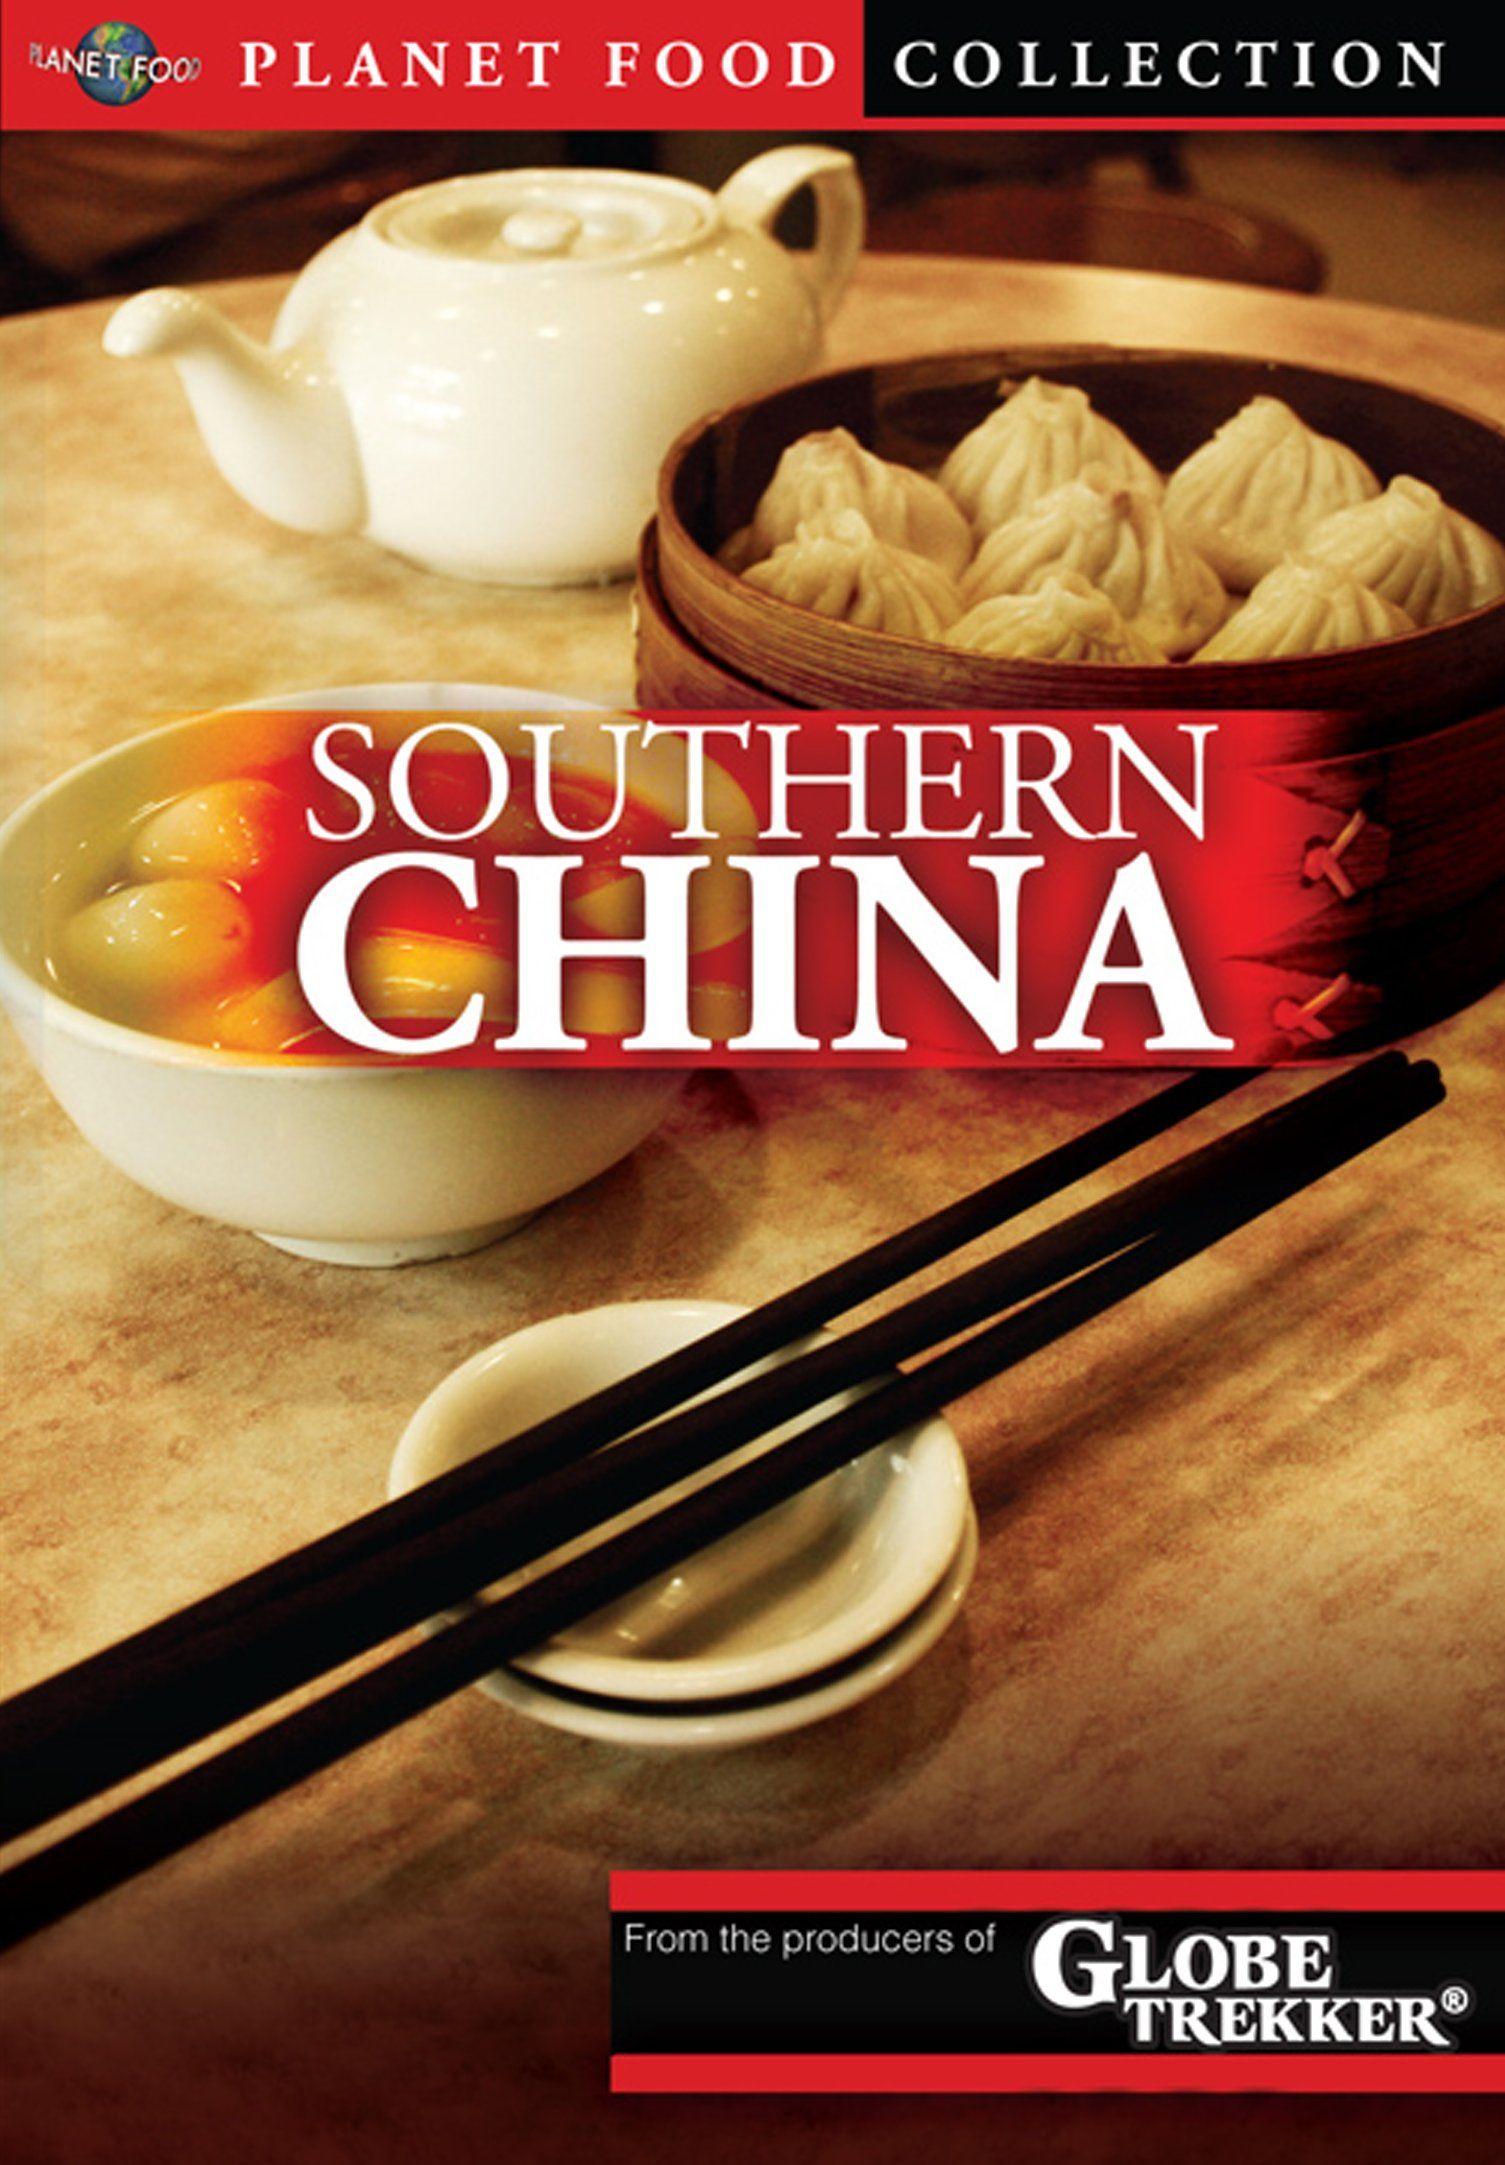 Planet Food: Southern China